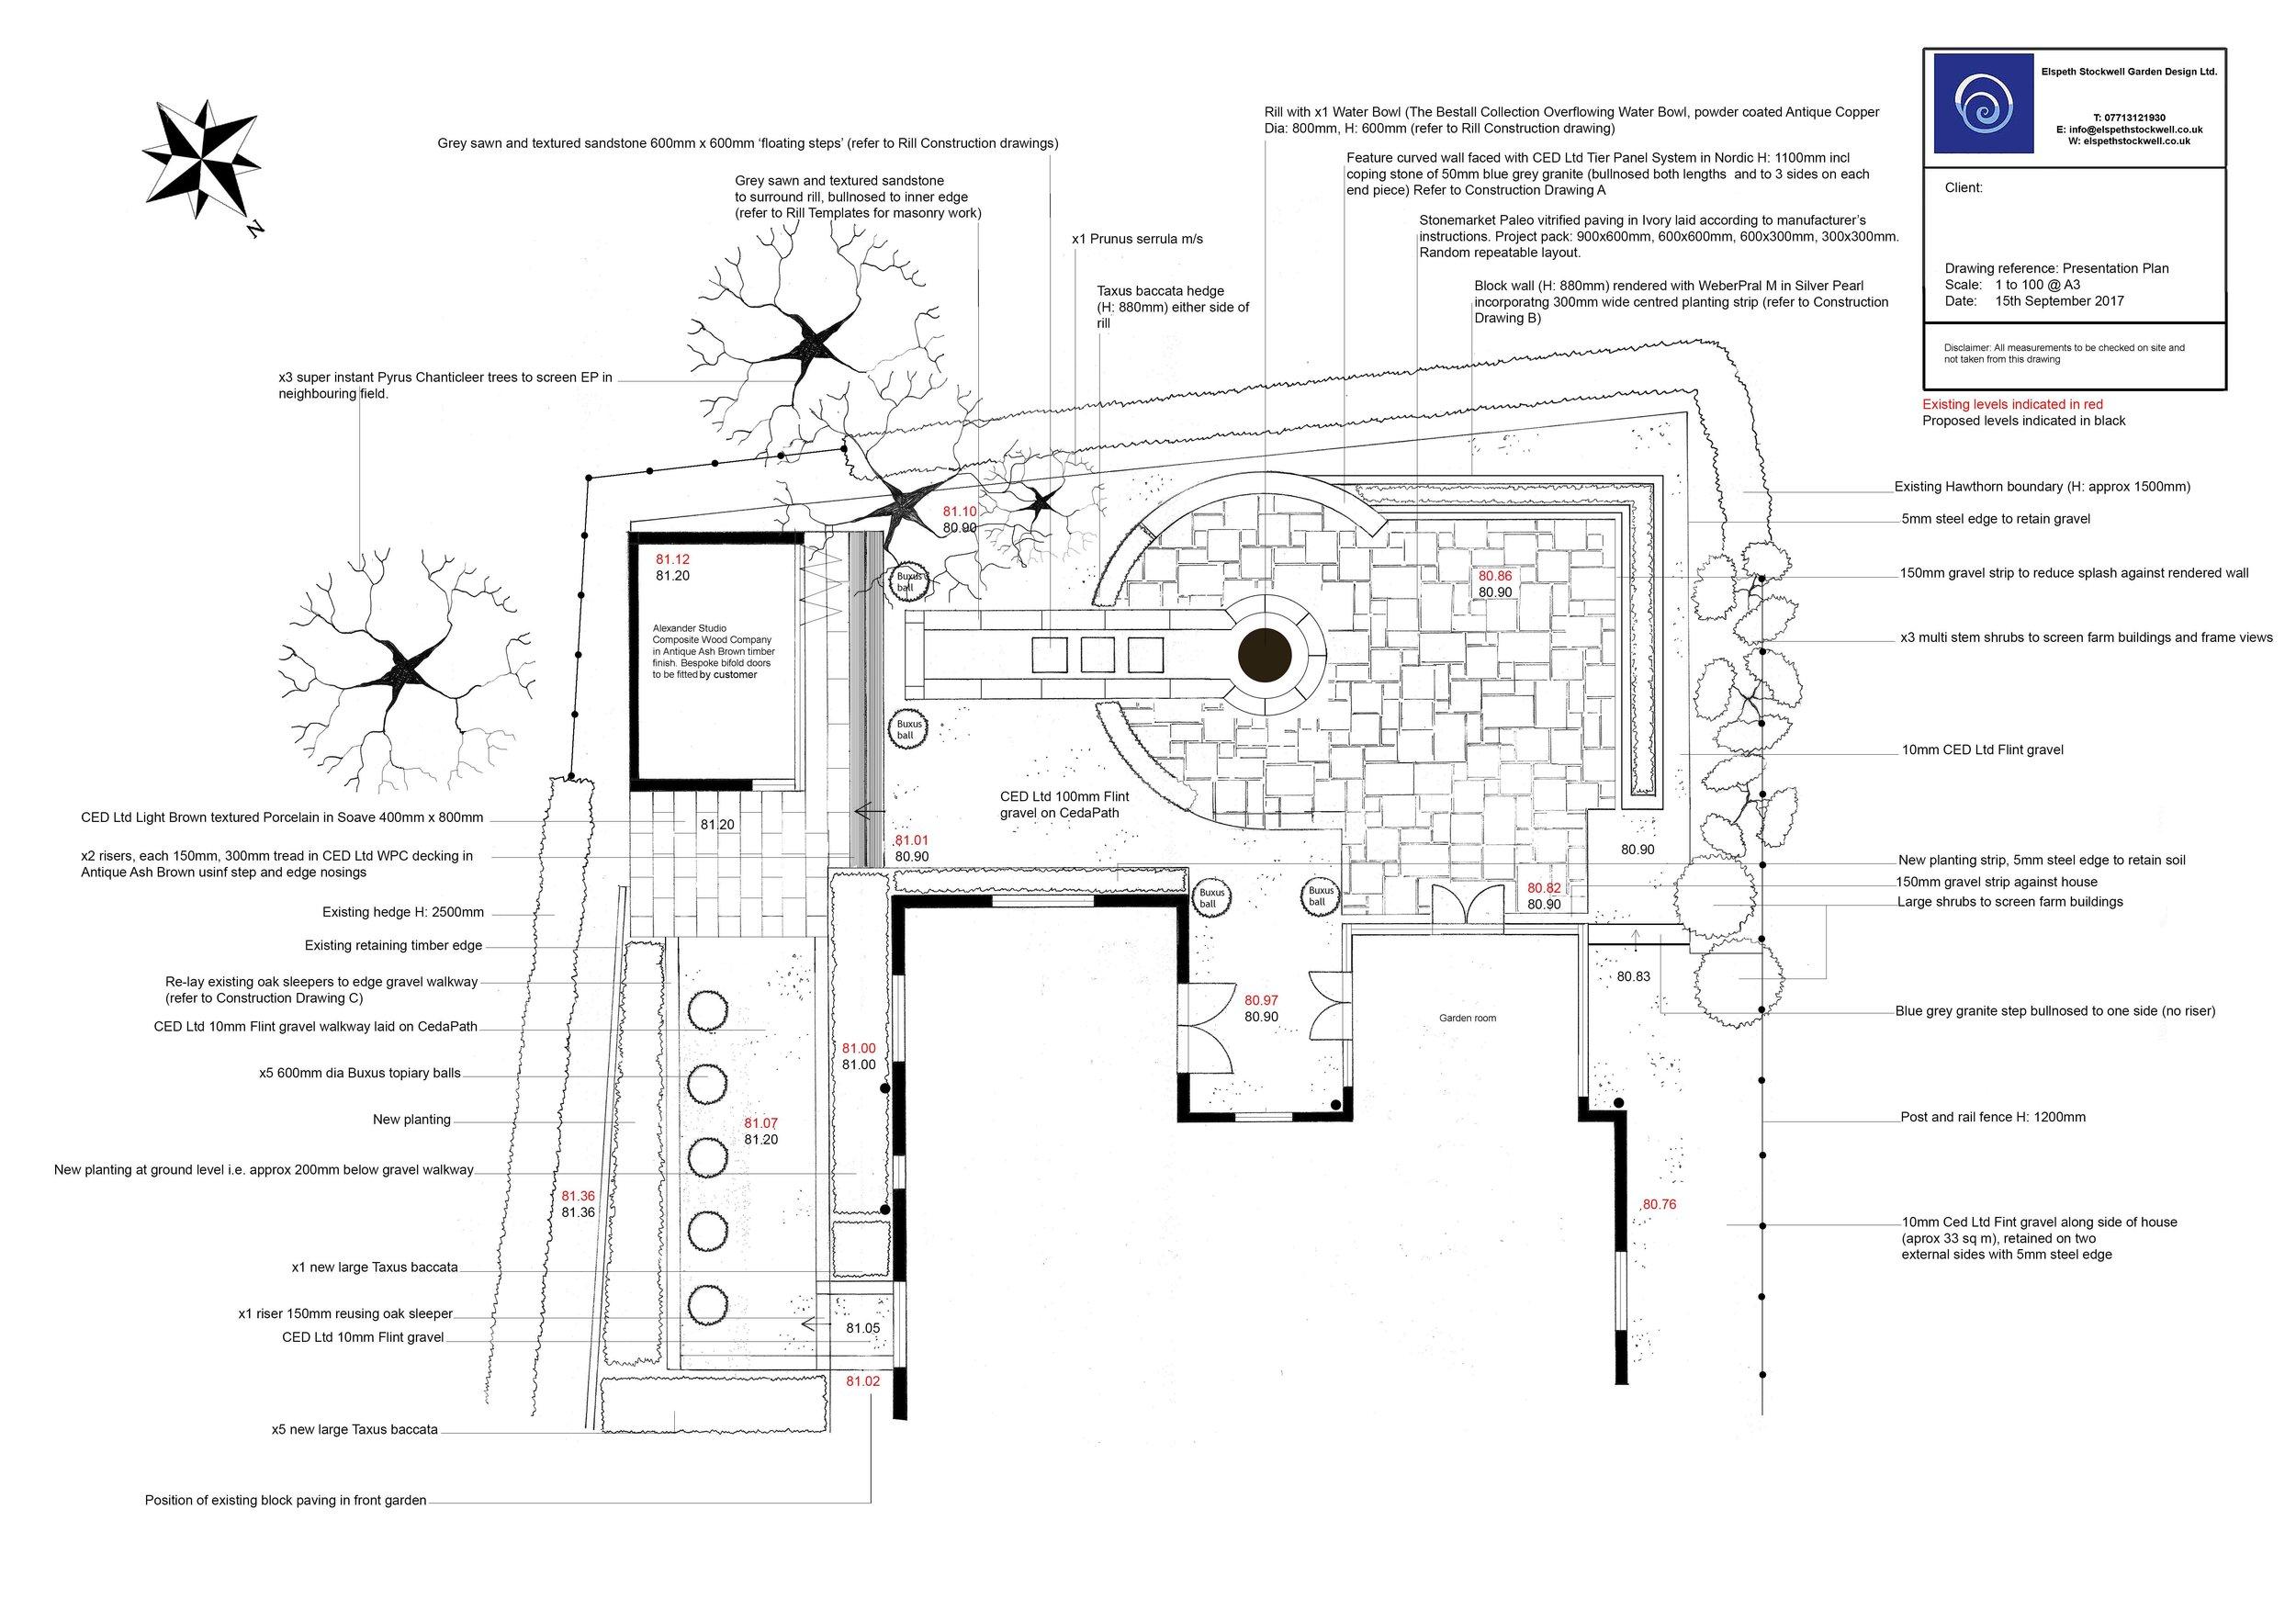 Final Presentataion Plan 15 September 2017.jpg